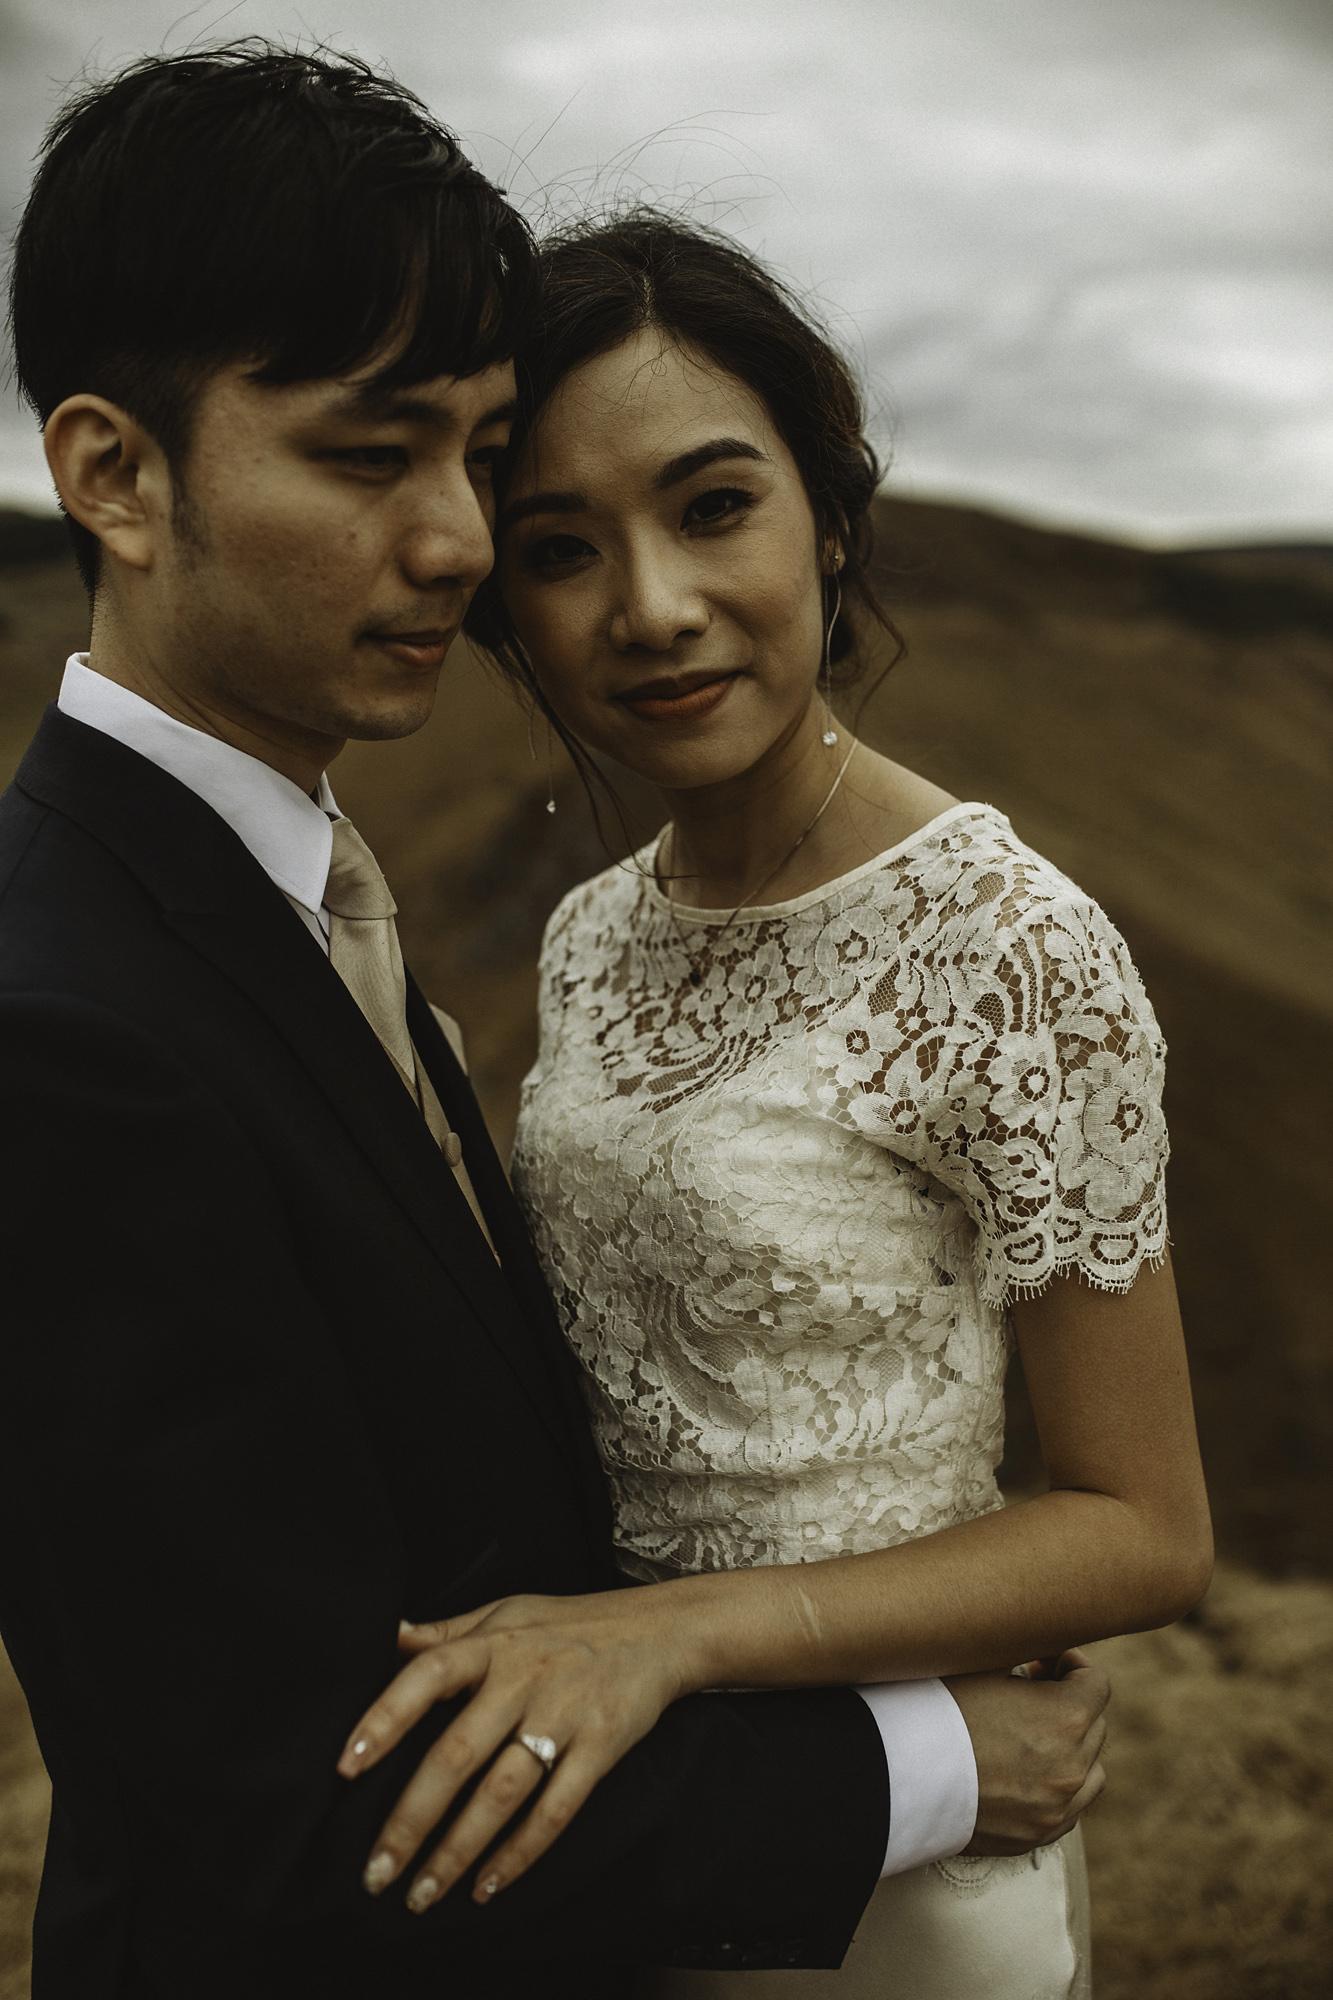 Kate-Beaumont-Wedding-Dress-Bridal-Separates-Peak-District-Shoot-9.jpg